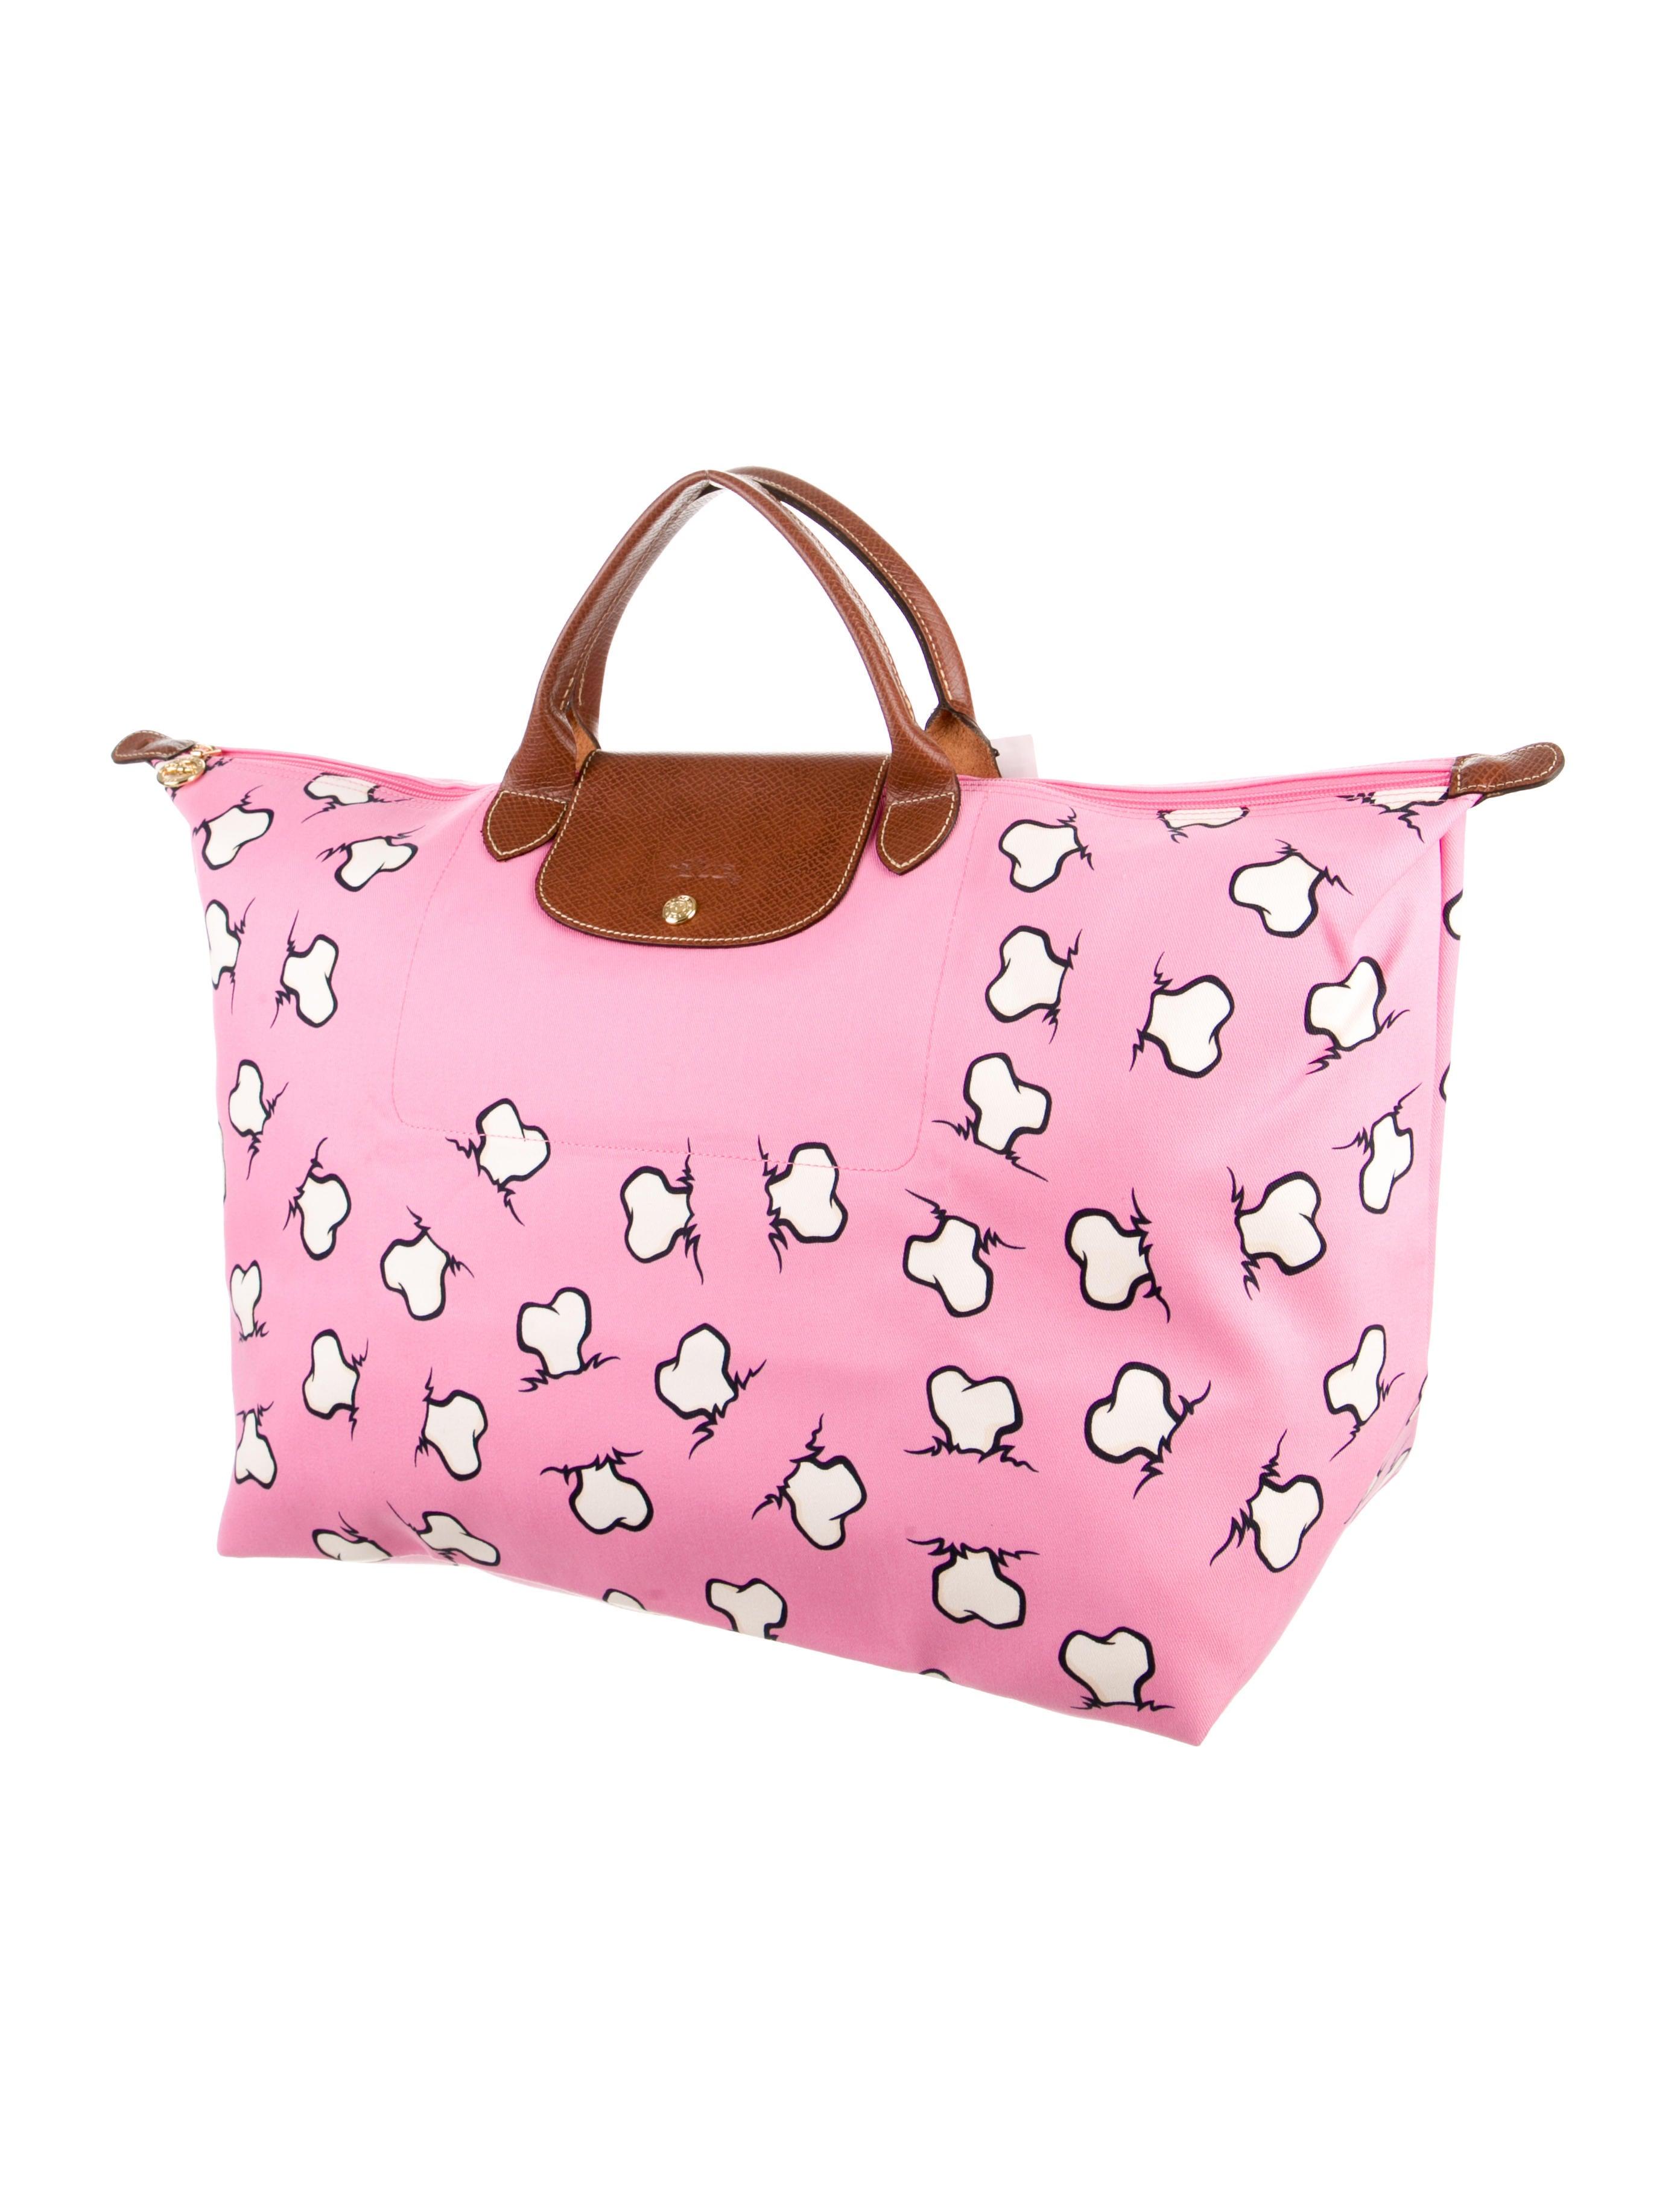 Longchamp Jeremy Scott Travel Bag